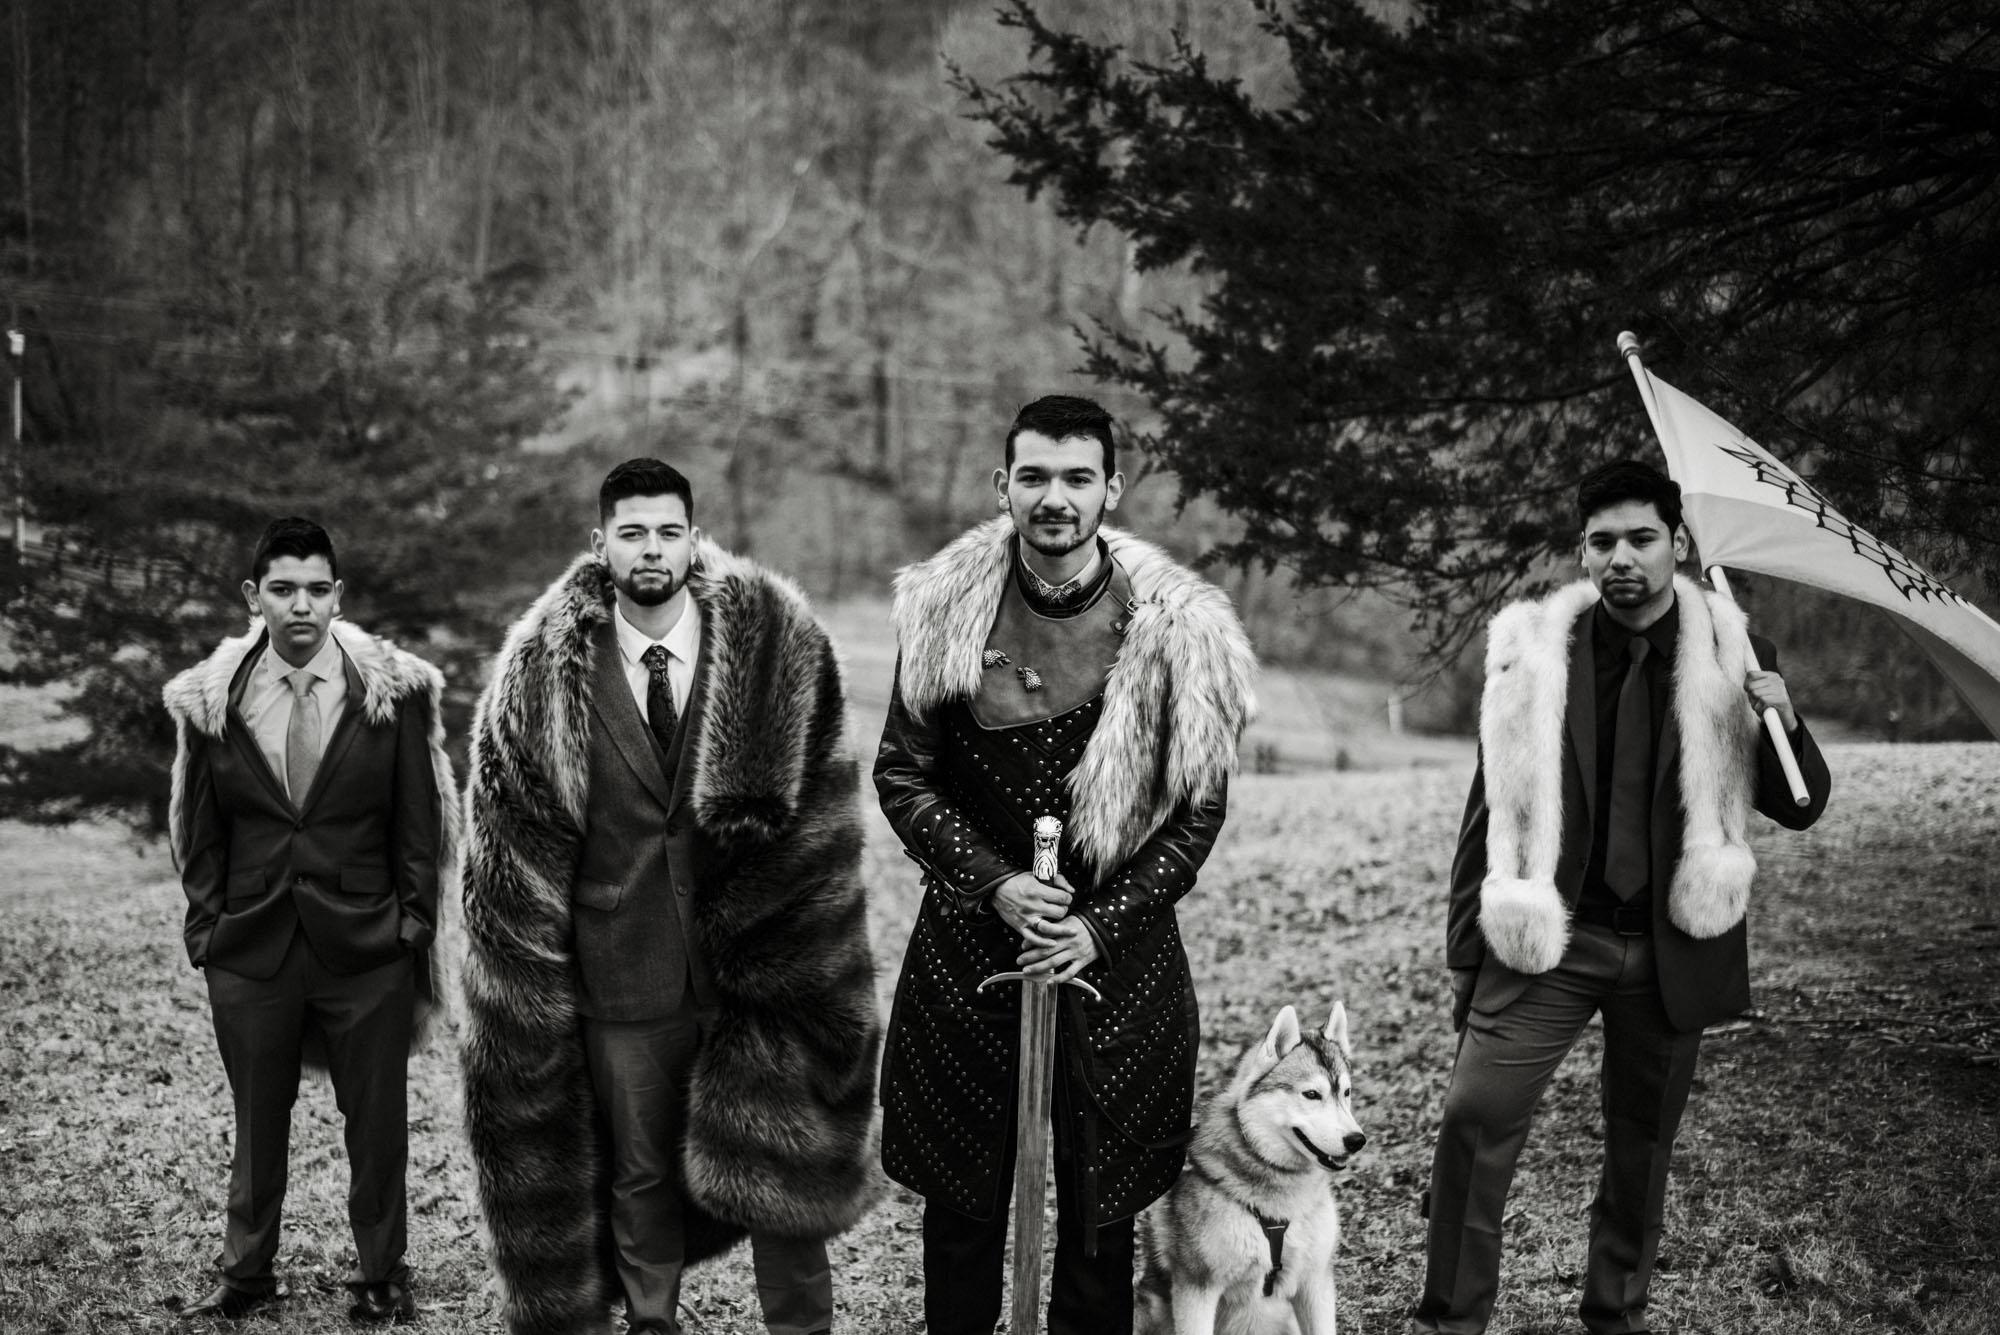 Game of Thrones Elopement - Winter Elopement - Shenandoah National Park Elopement Photographer - Virginia Adventure Photographer - Blue Ridge Parkway Elopement Photographer_45.jpg